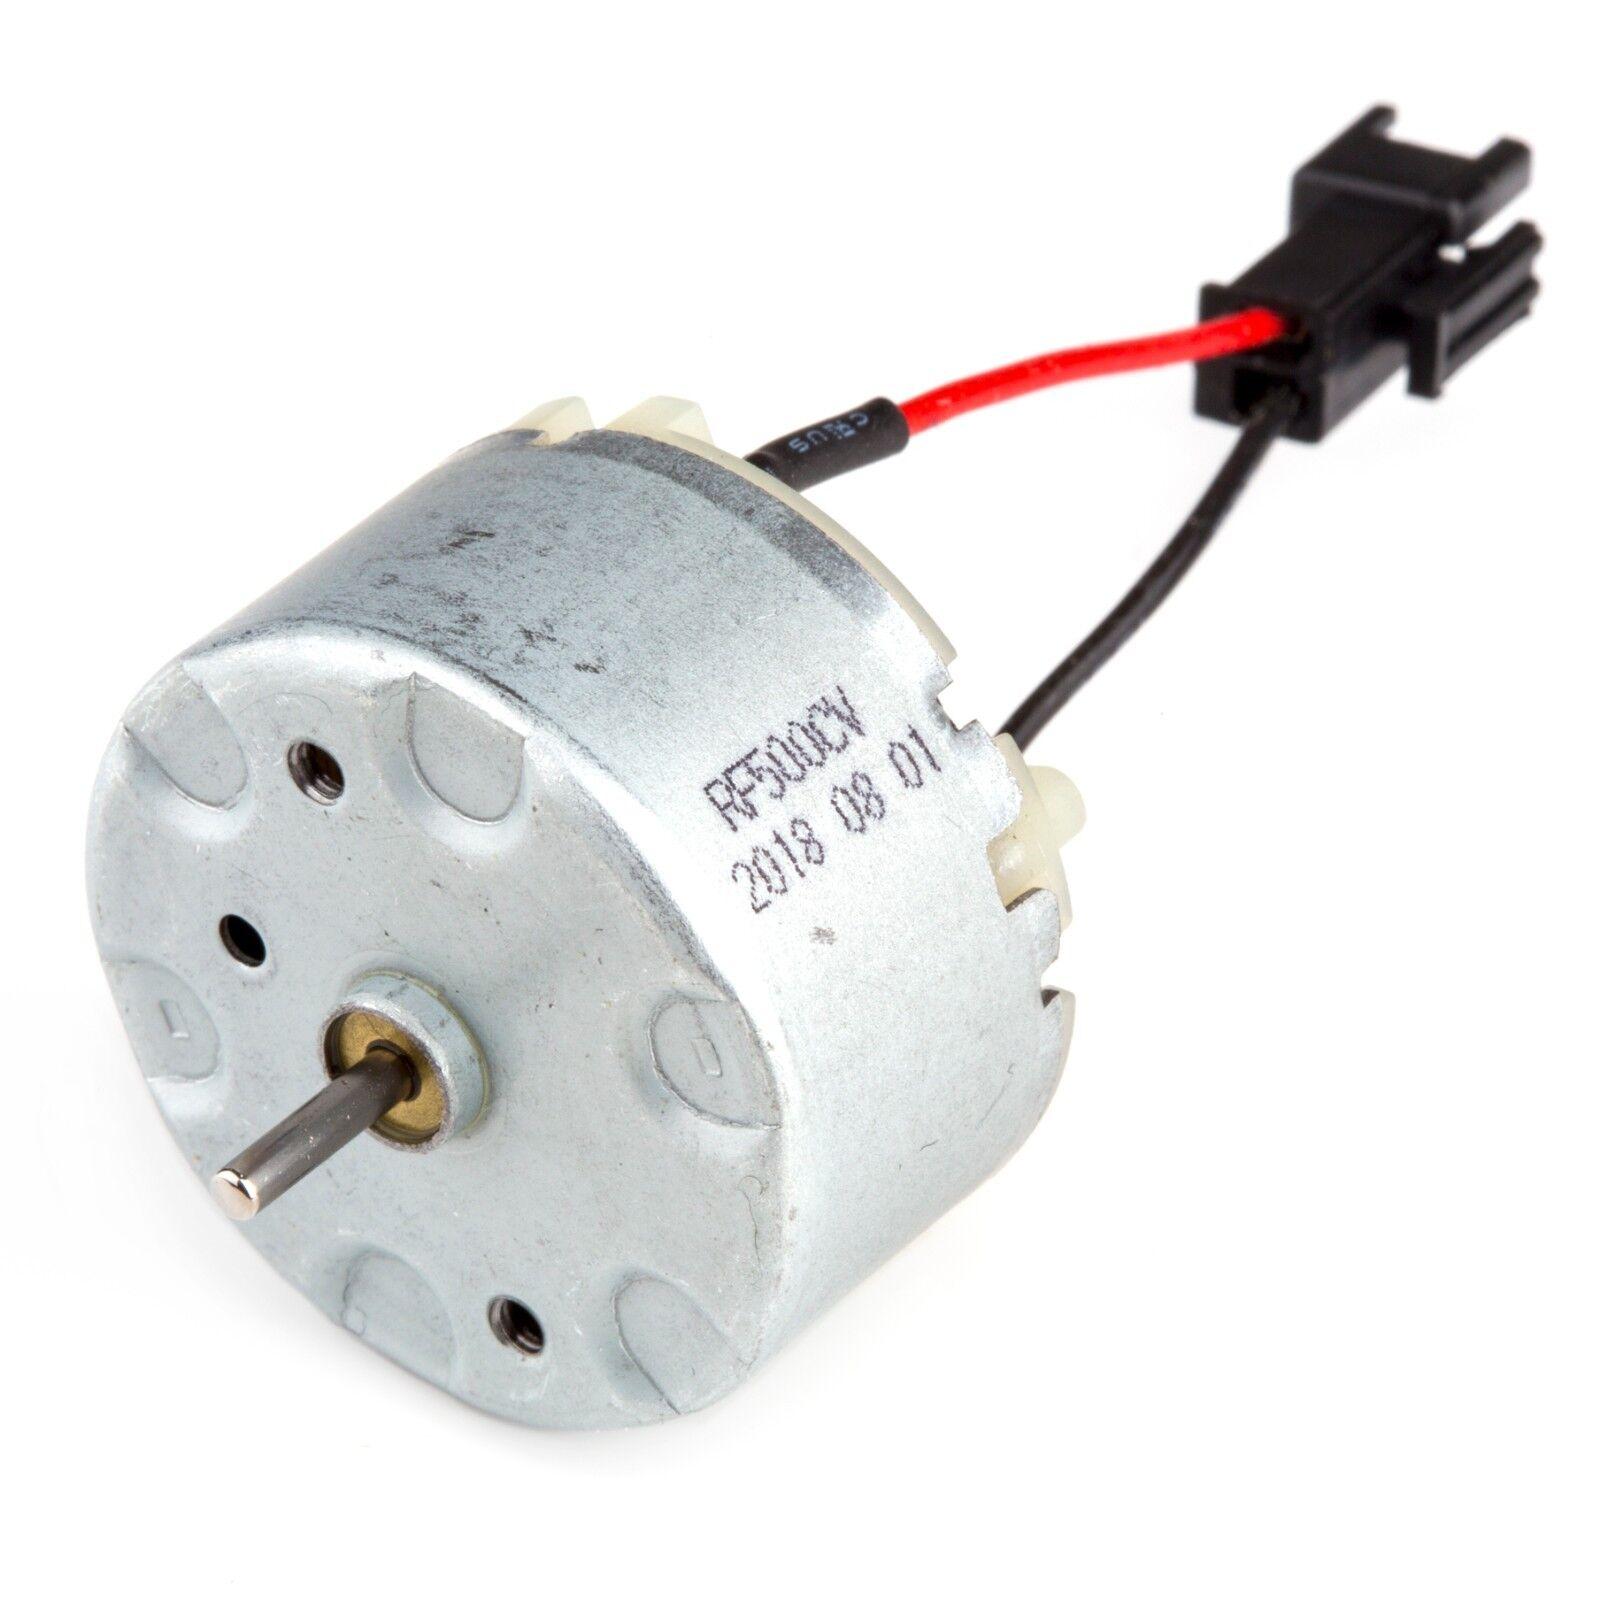 Low Voltage Eco Friendly Dc Motor Fix Diy Stove Wood